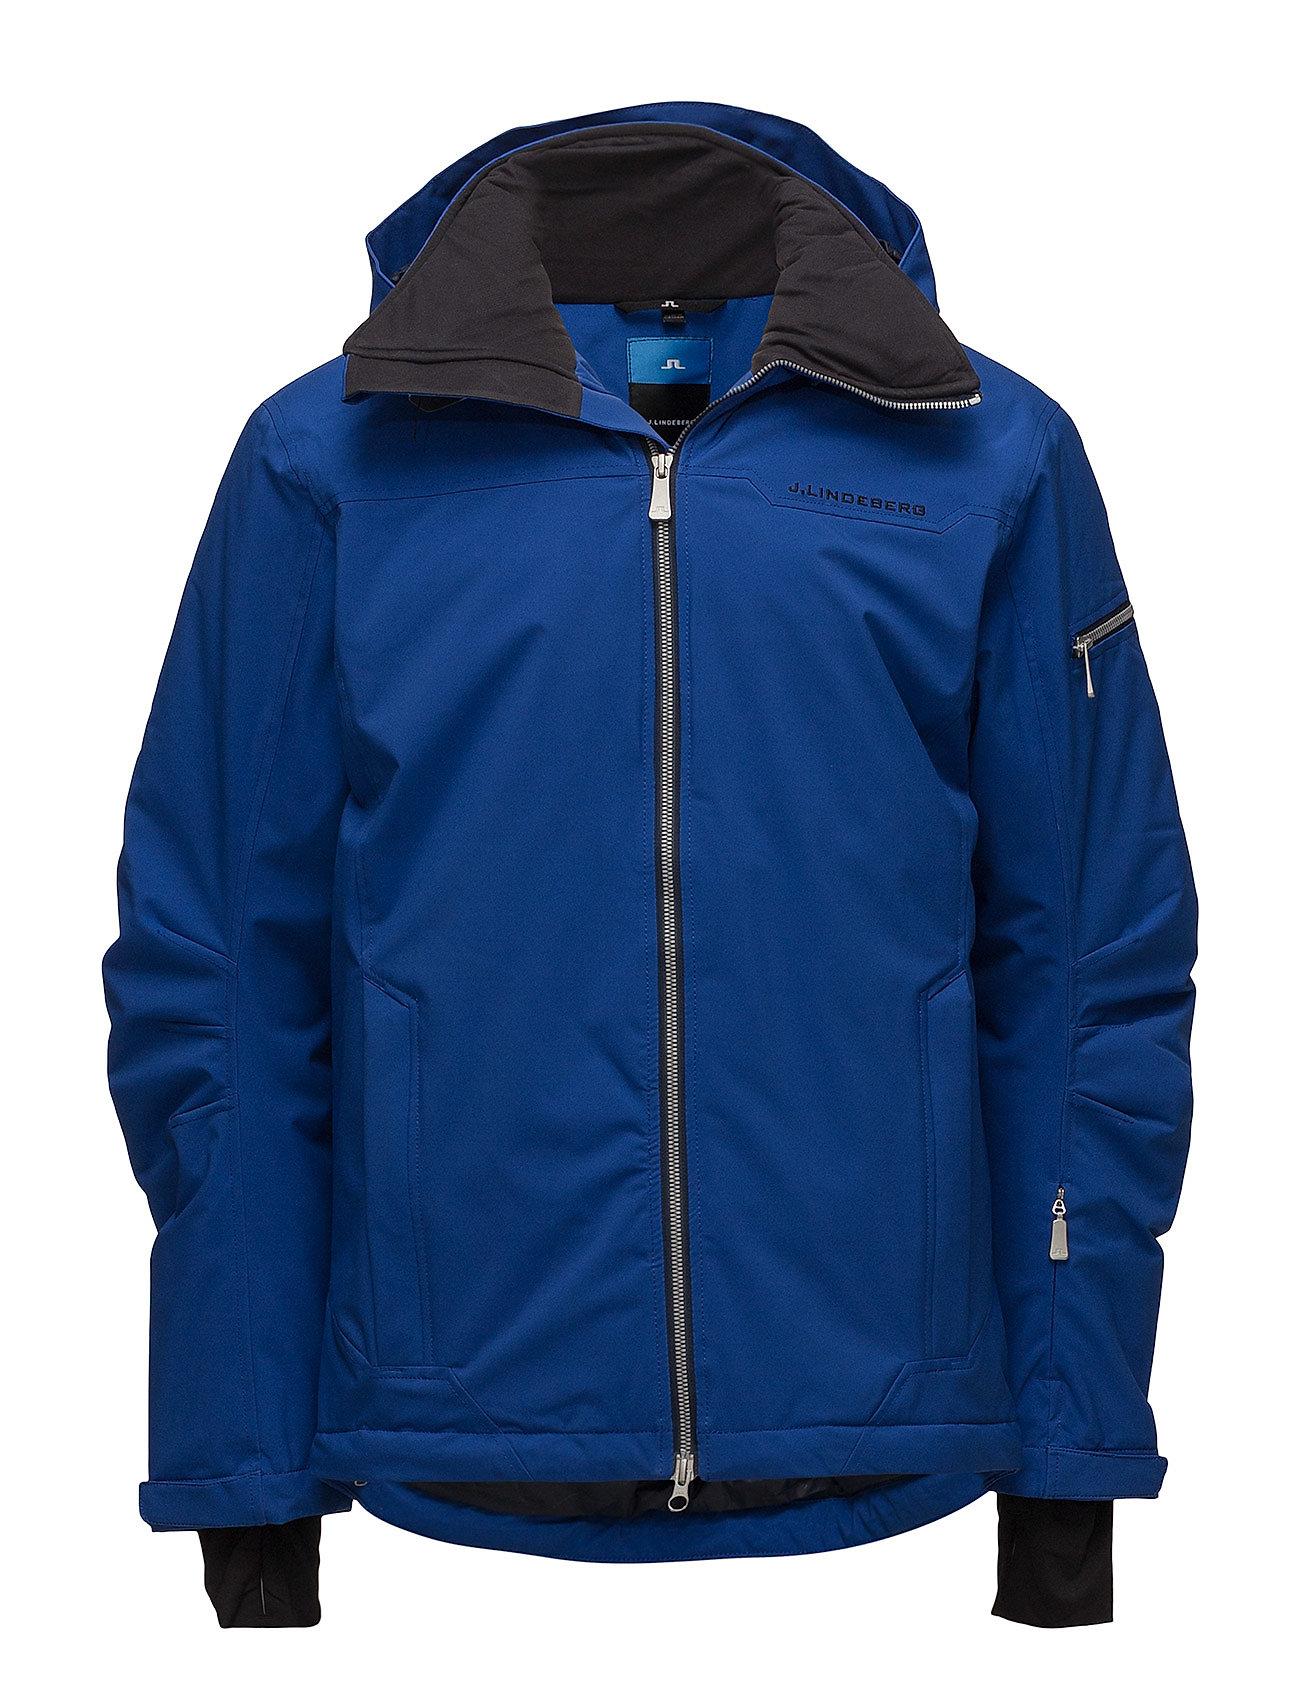 J. Lindeberg Ski M Truuli Jacket JL 2L